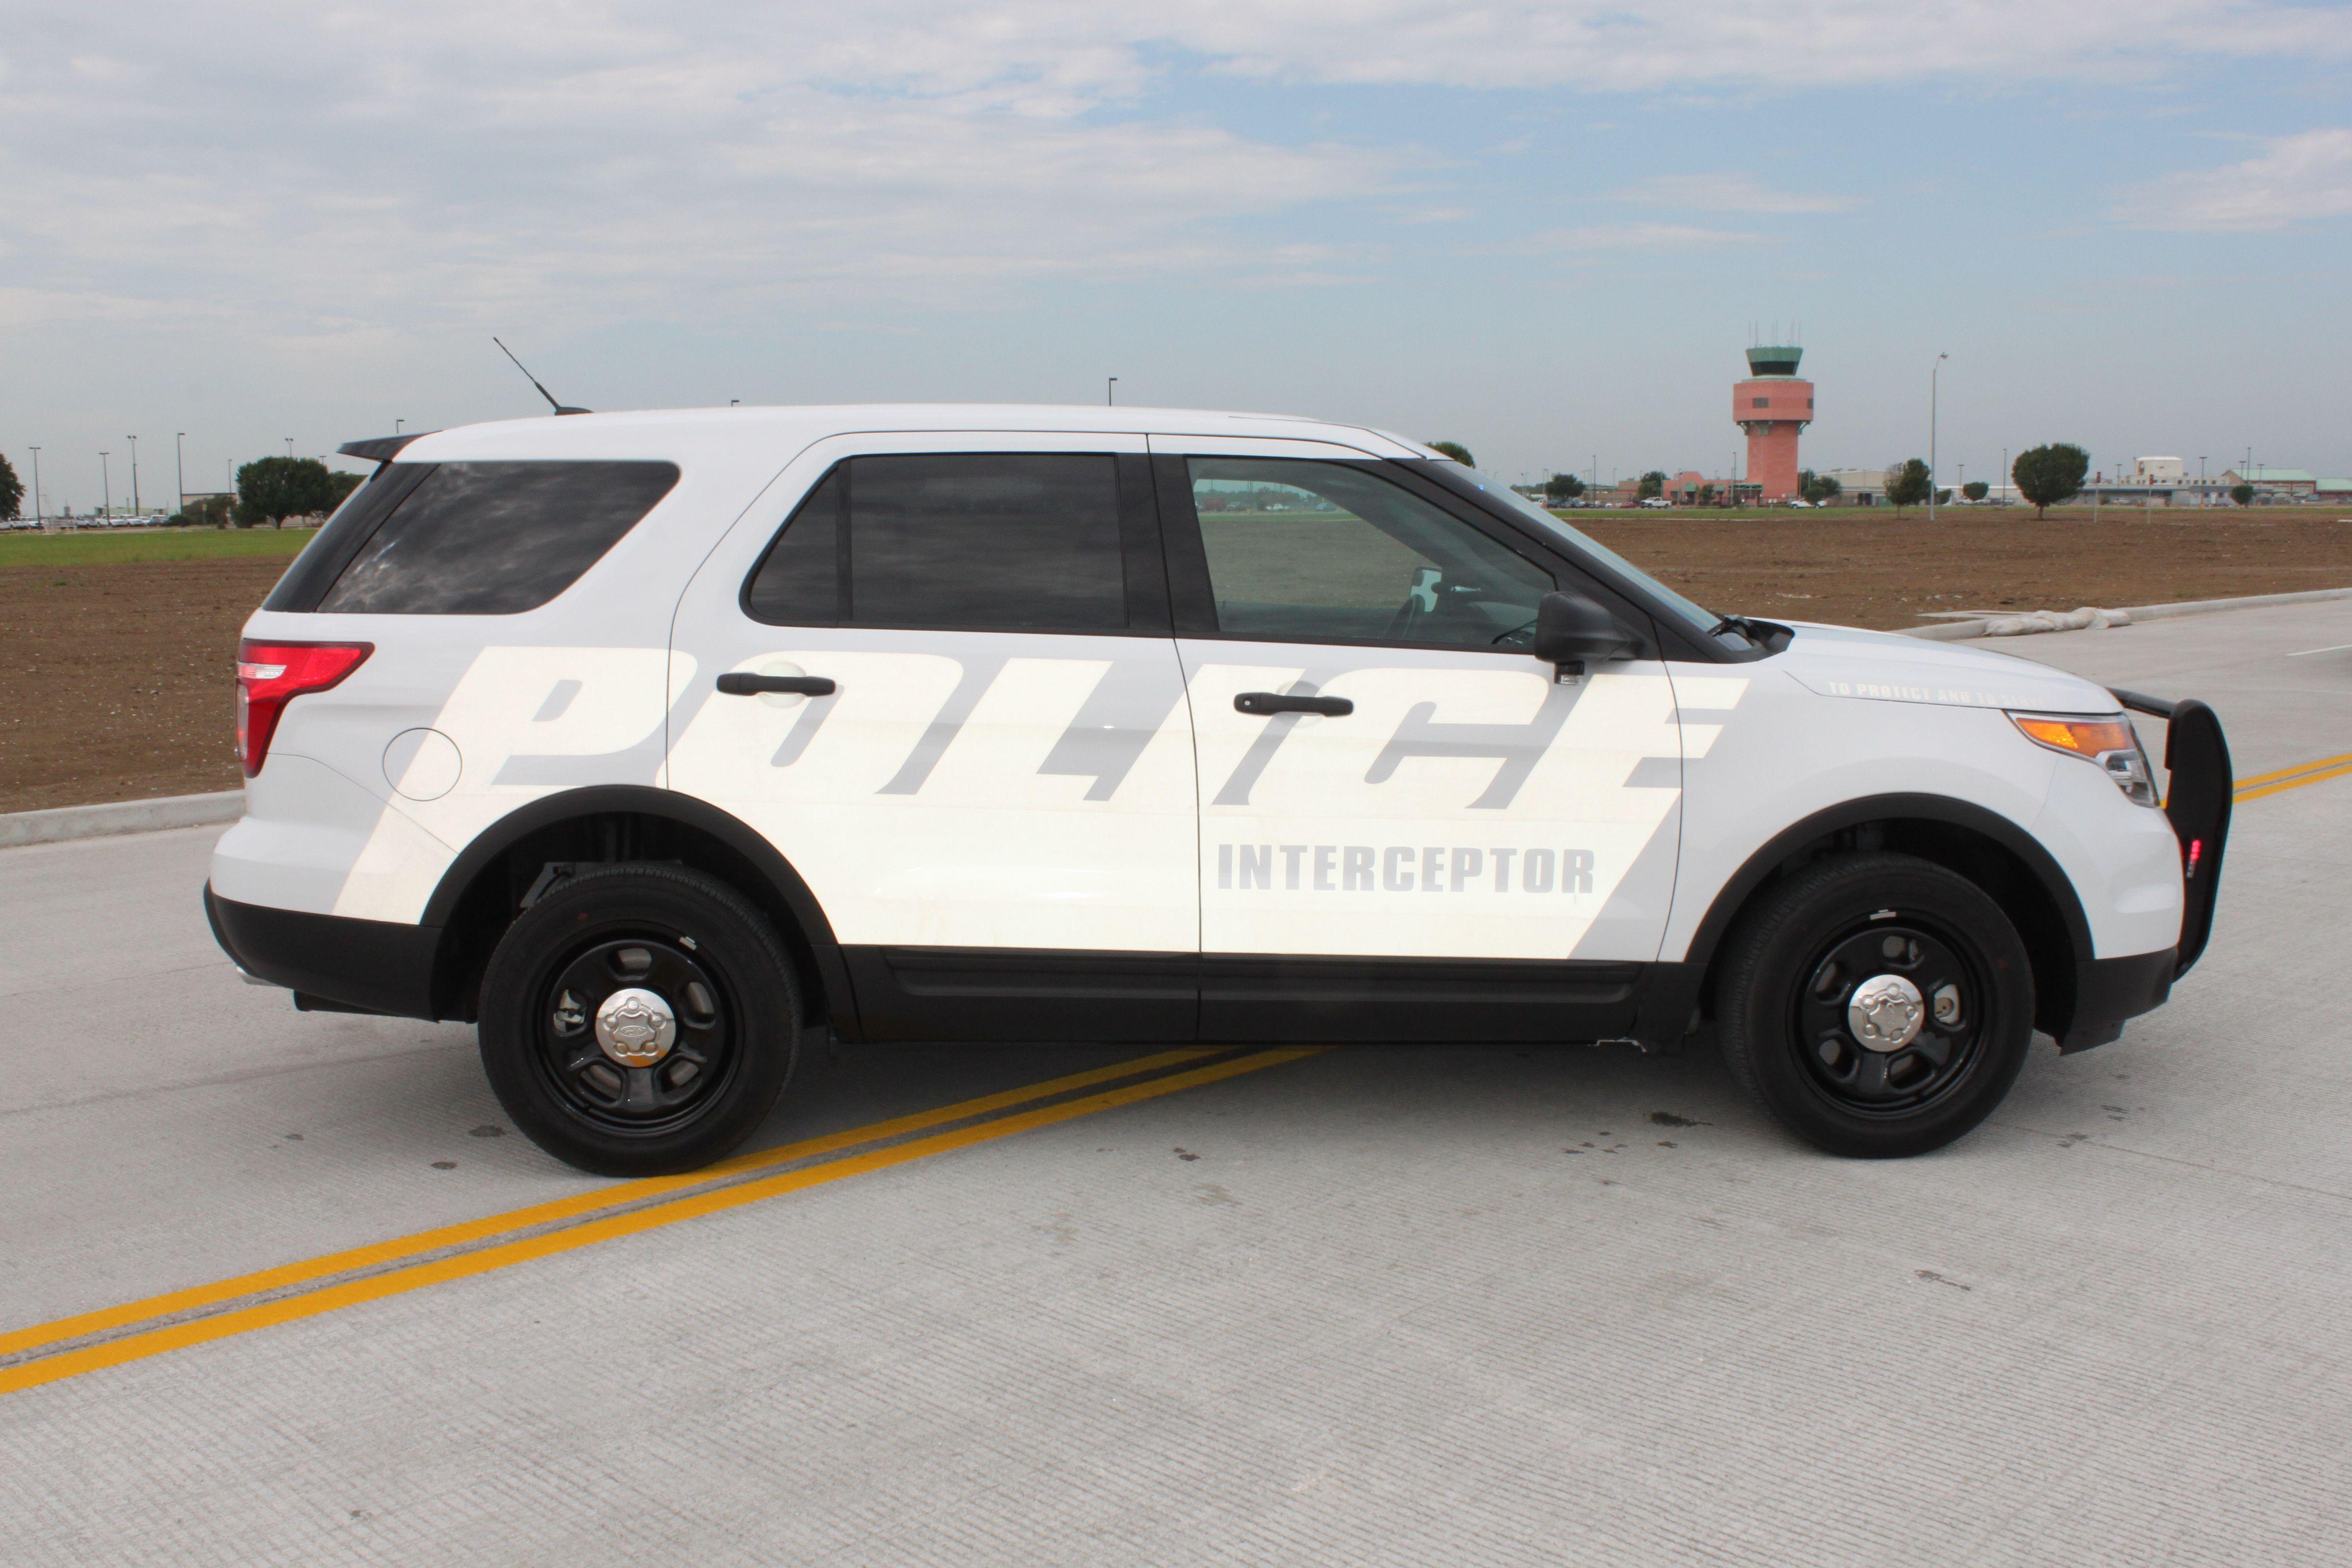 2013 Ford Police Interceptor SUV | Authority | Pinterest